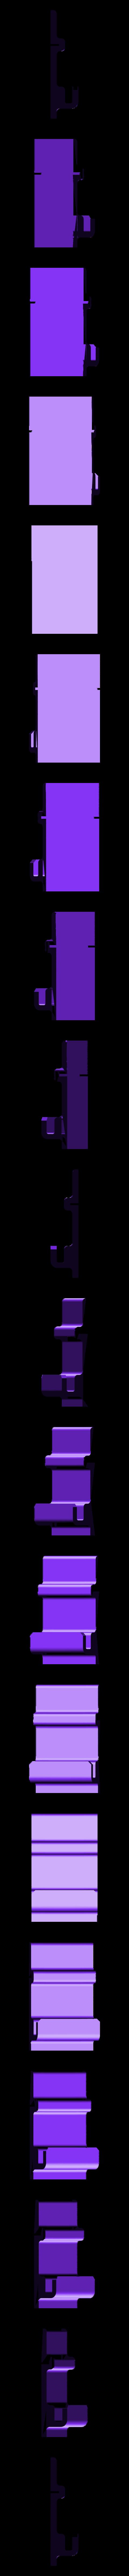 hook_5mm.stl Download free STL file FlashForge Adventurer3 Mirror Hook • 3D printing template, CyberCyclist